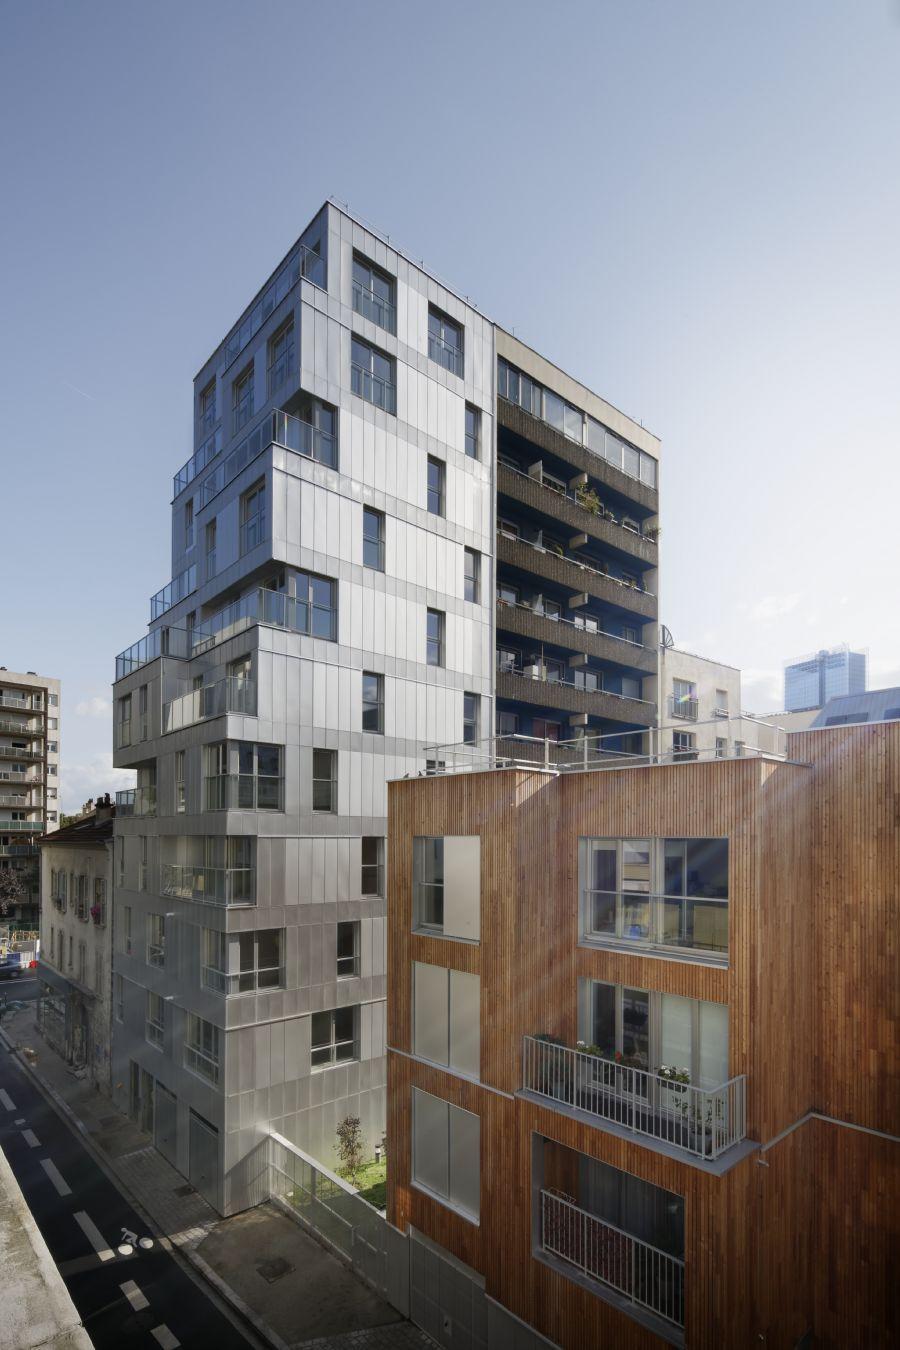 30 logements à Clichy-la-Garenne - Arch. Erik Giudice Architecture - Photo : Camille Gharbi